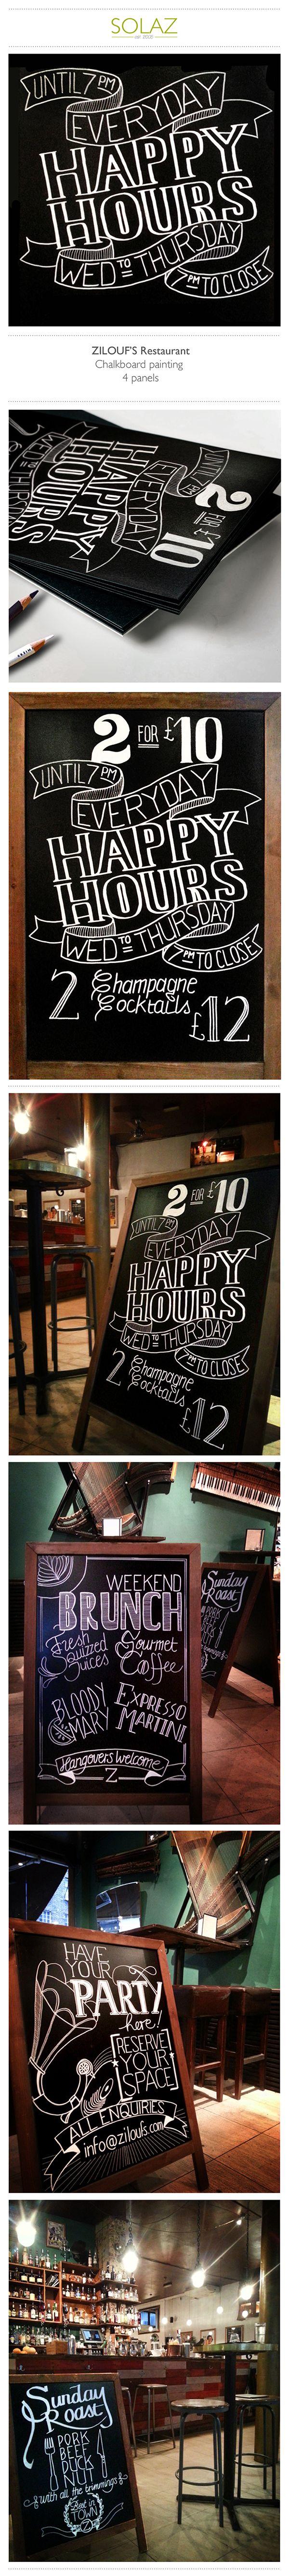 ZILOUF'S Restaurant Chalkboard painting on Behance #handlettering #typography #restaurant // designbysolaz.com